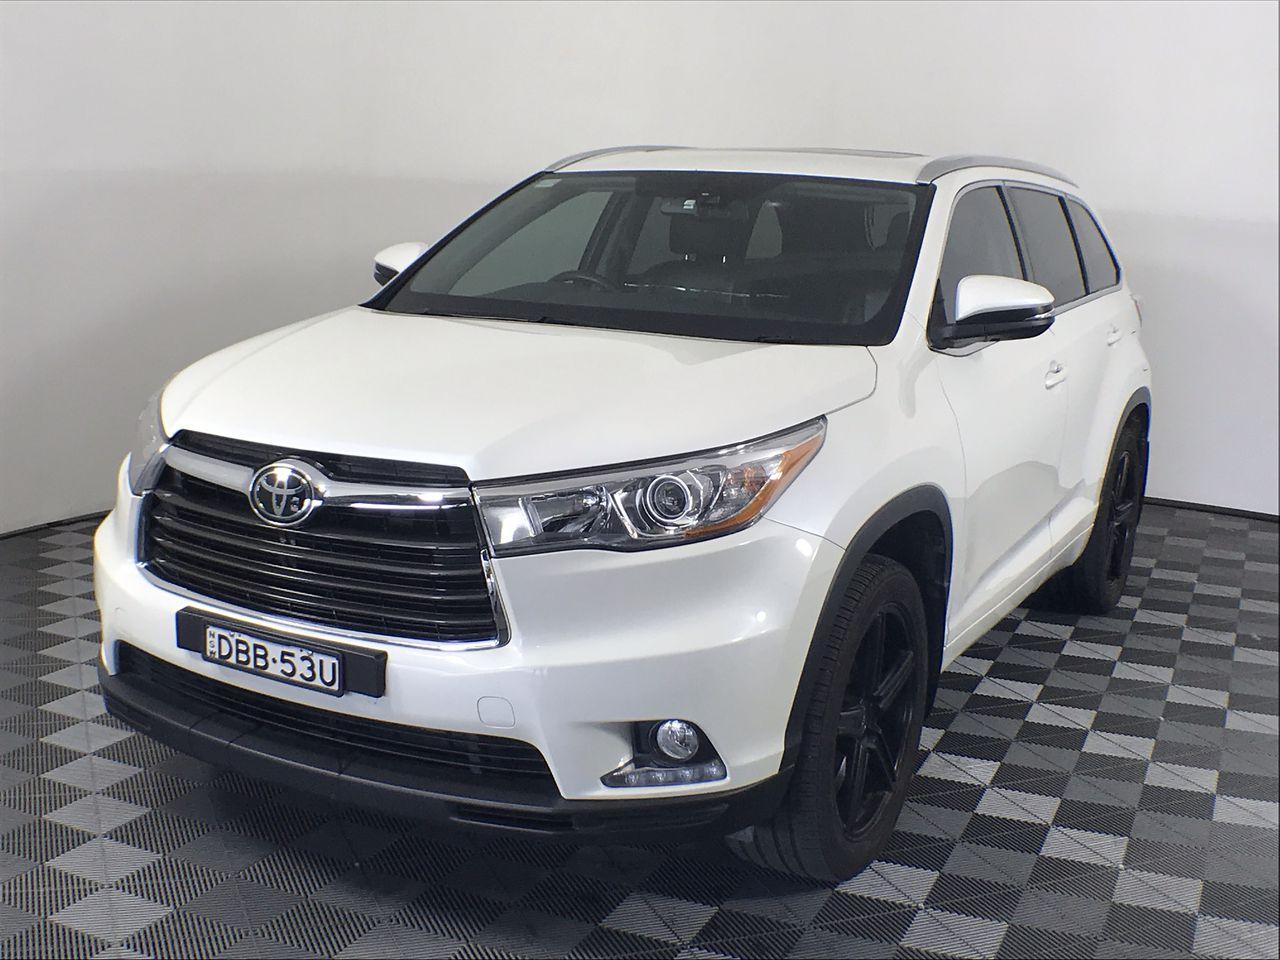 2015 Toyota Kluger Grande (4x4) GSU55R Automatic 7 Seats Wagon 99,042km